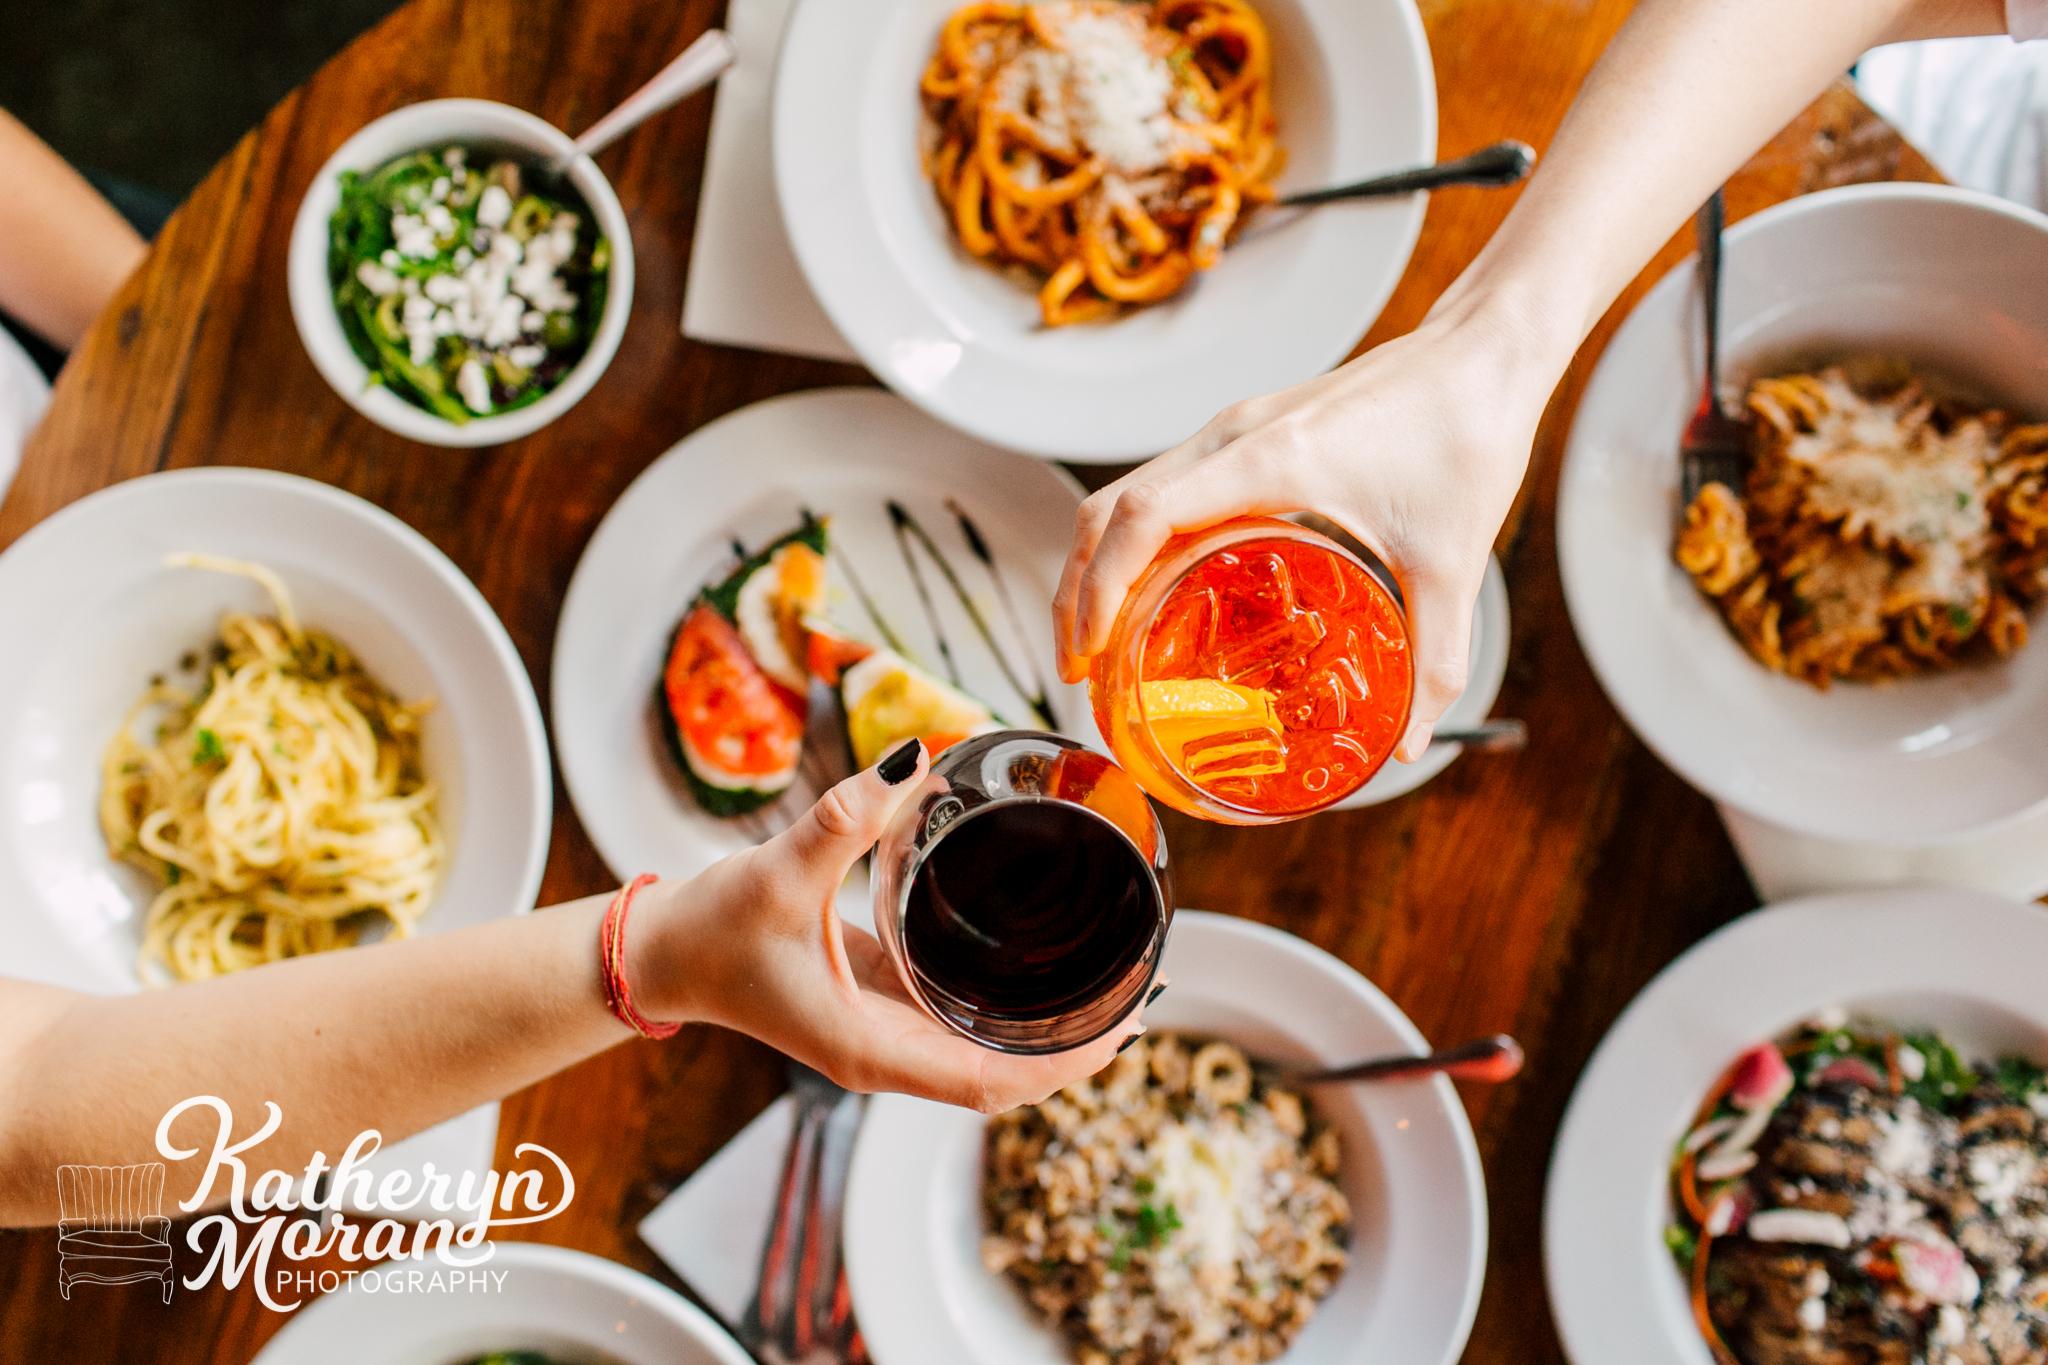 seattle-food-photographer-katheryn-moran-due-cucuina-italiana-2018-20.jpg